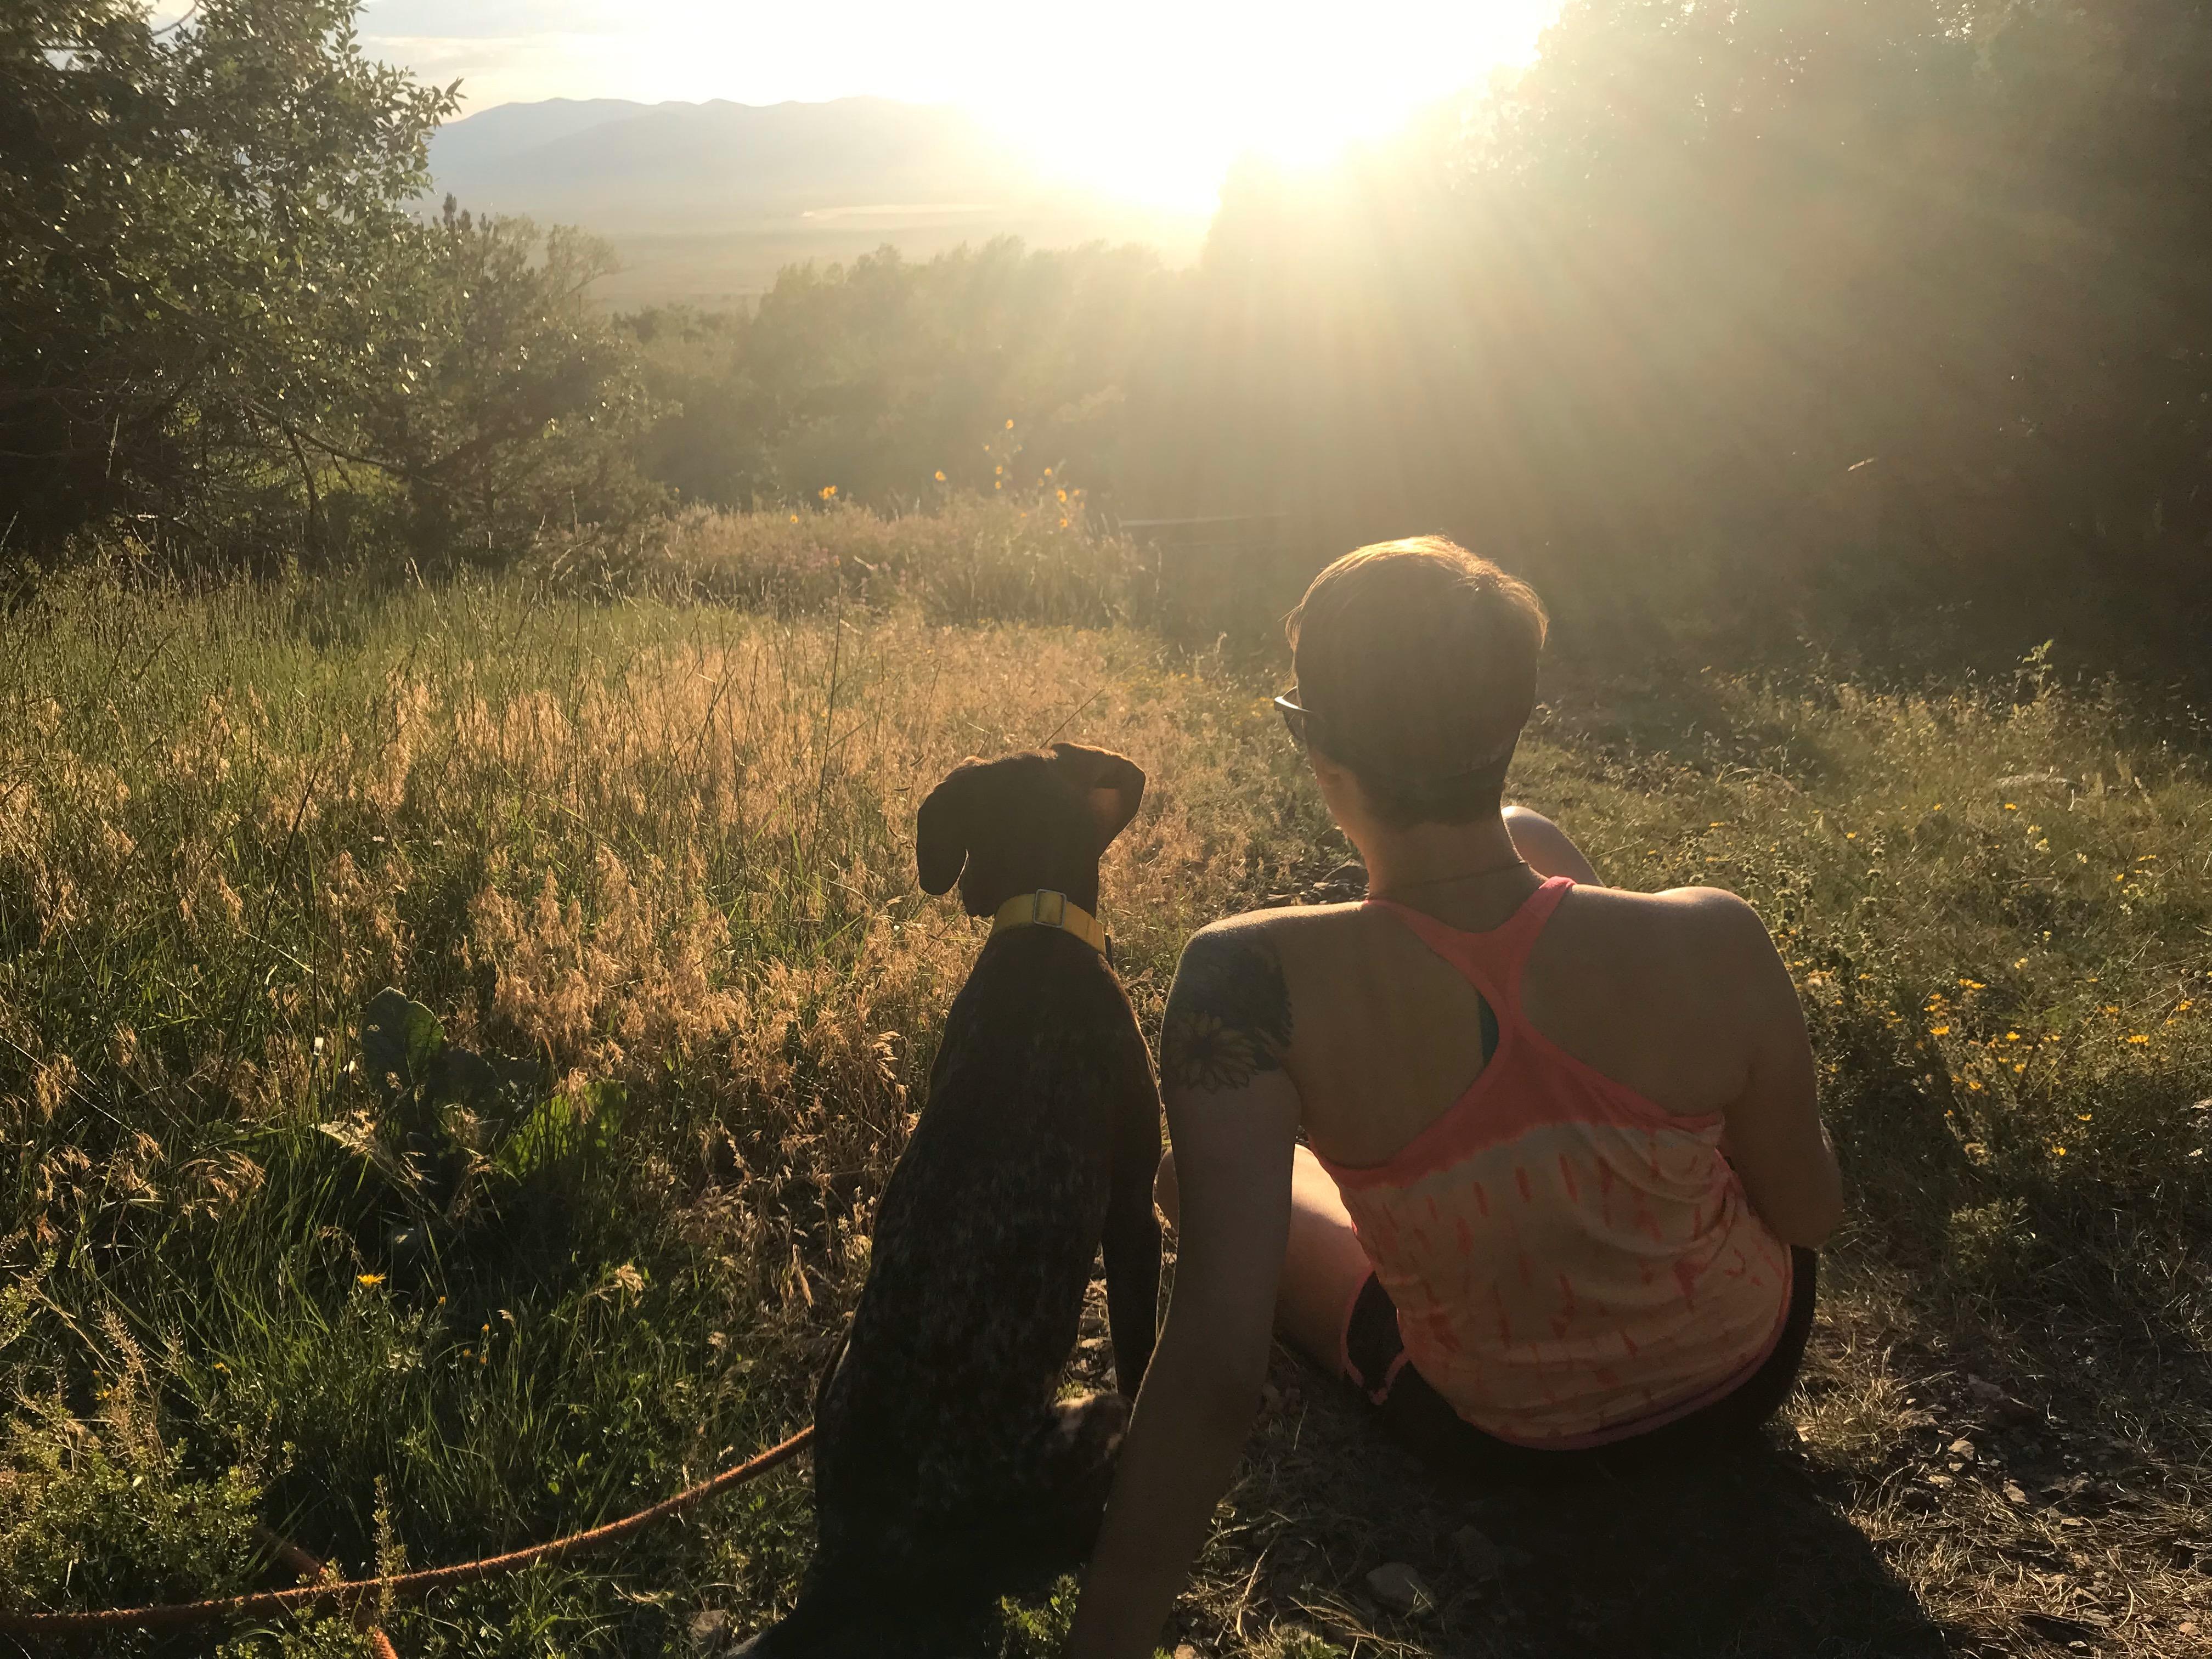 Dog and woman at sunrise